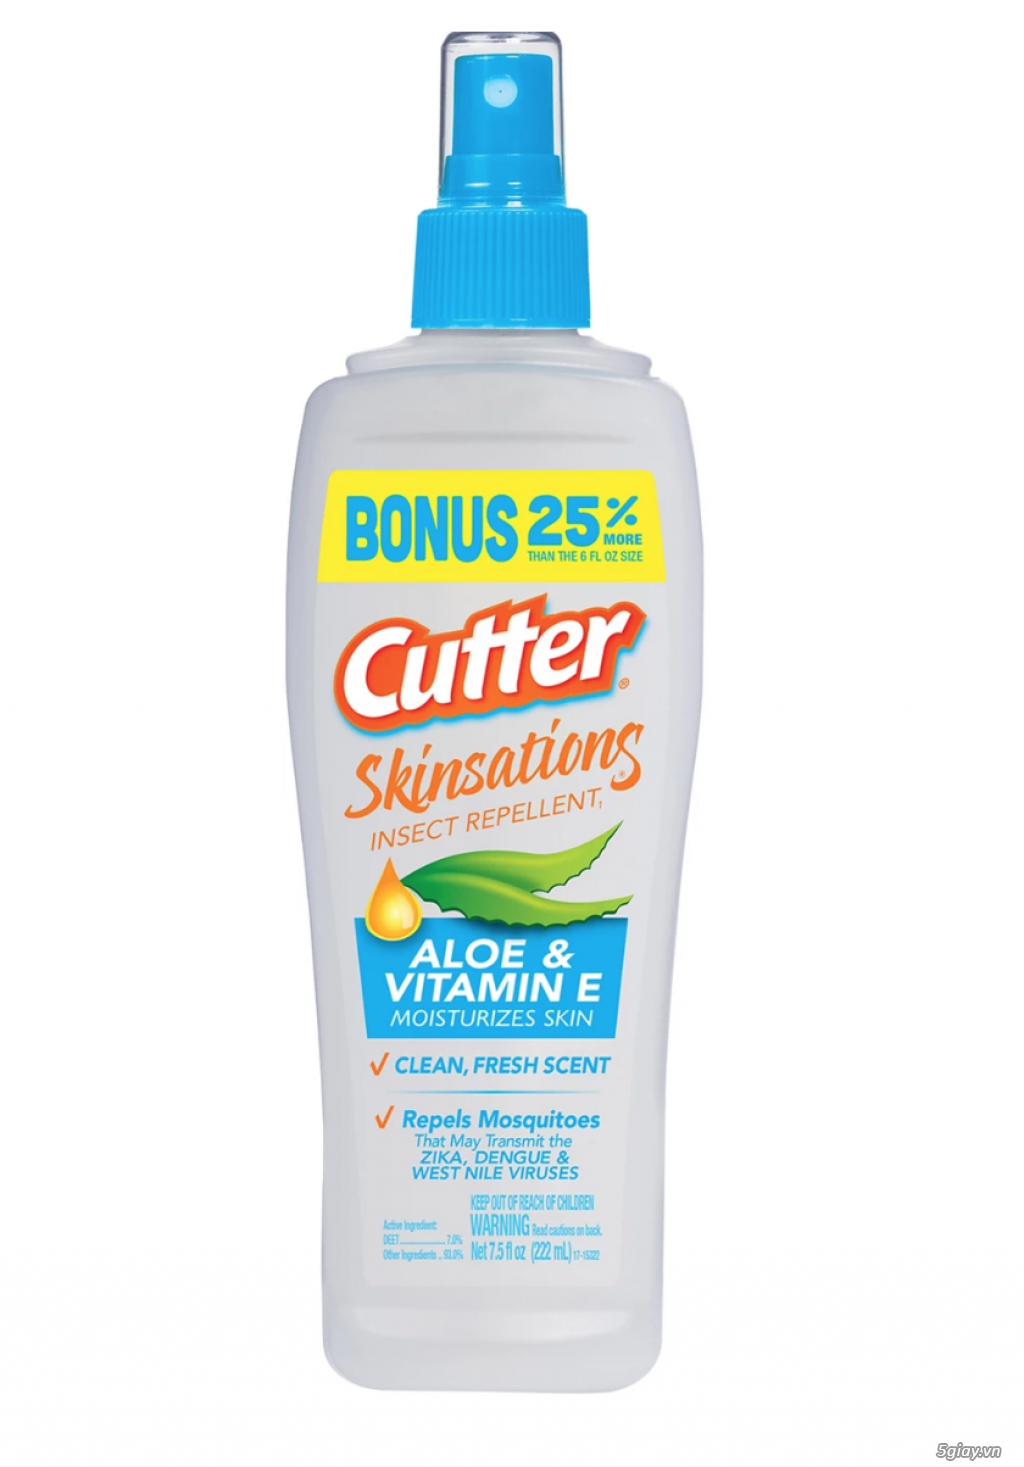 Kem Mờ Sẹo Aquaphor, Kẹo Dinh Dưỡng, Kem Chống Muỗi Từ AHHA Mỹ 100% - 4